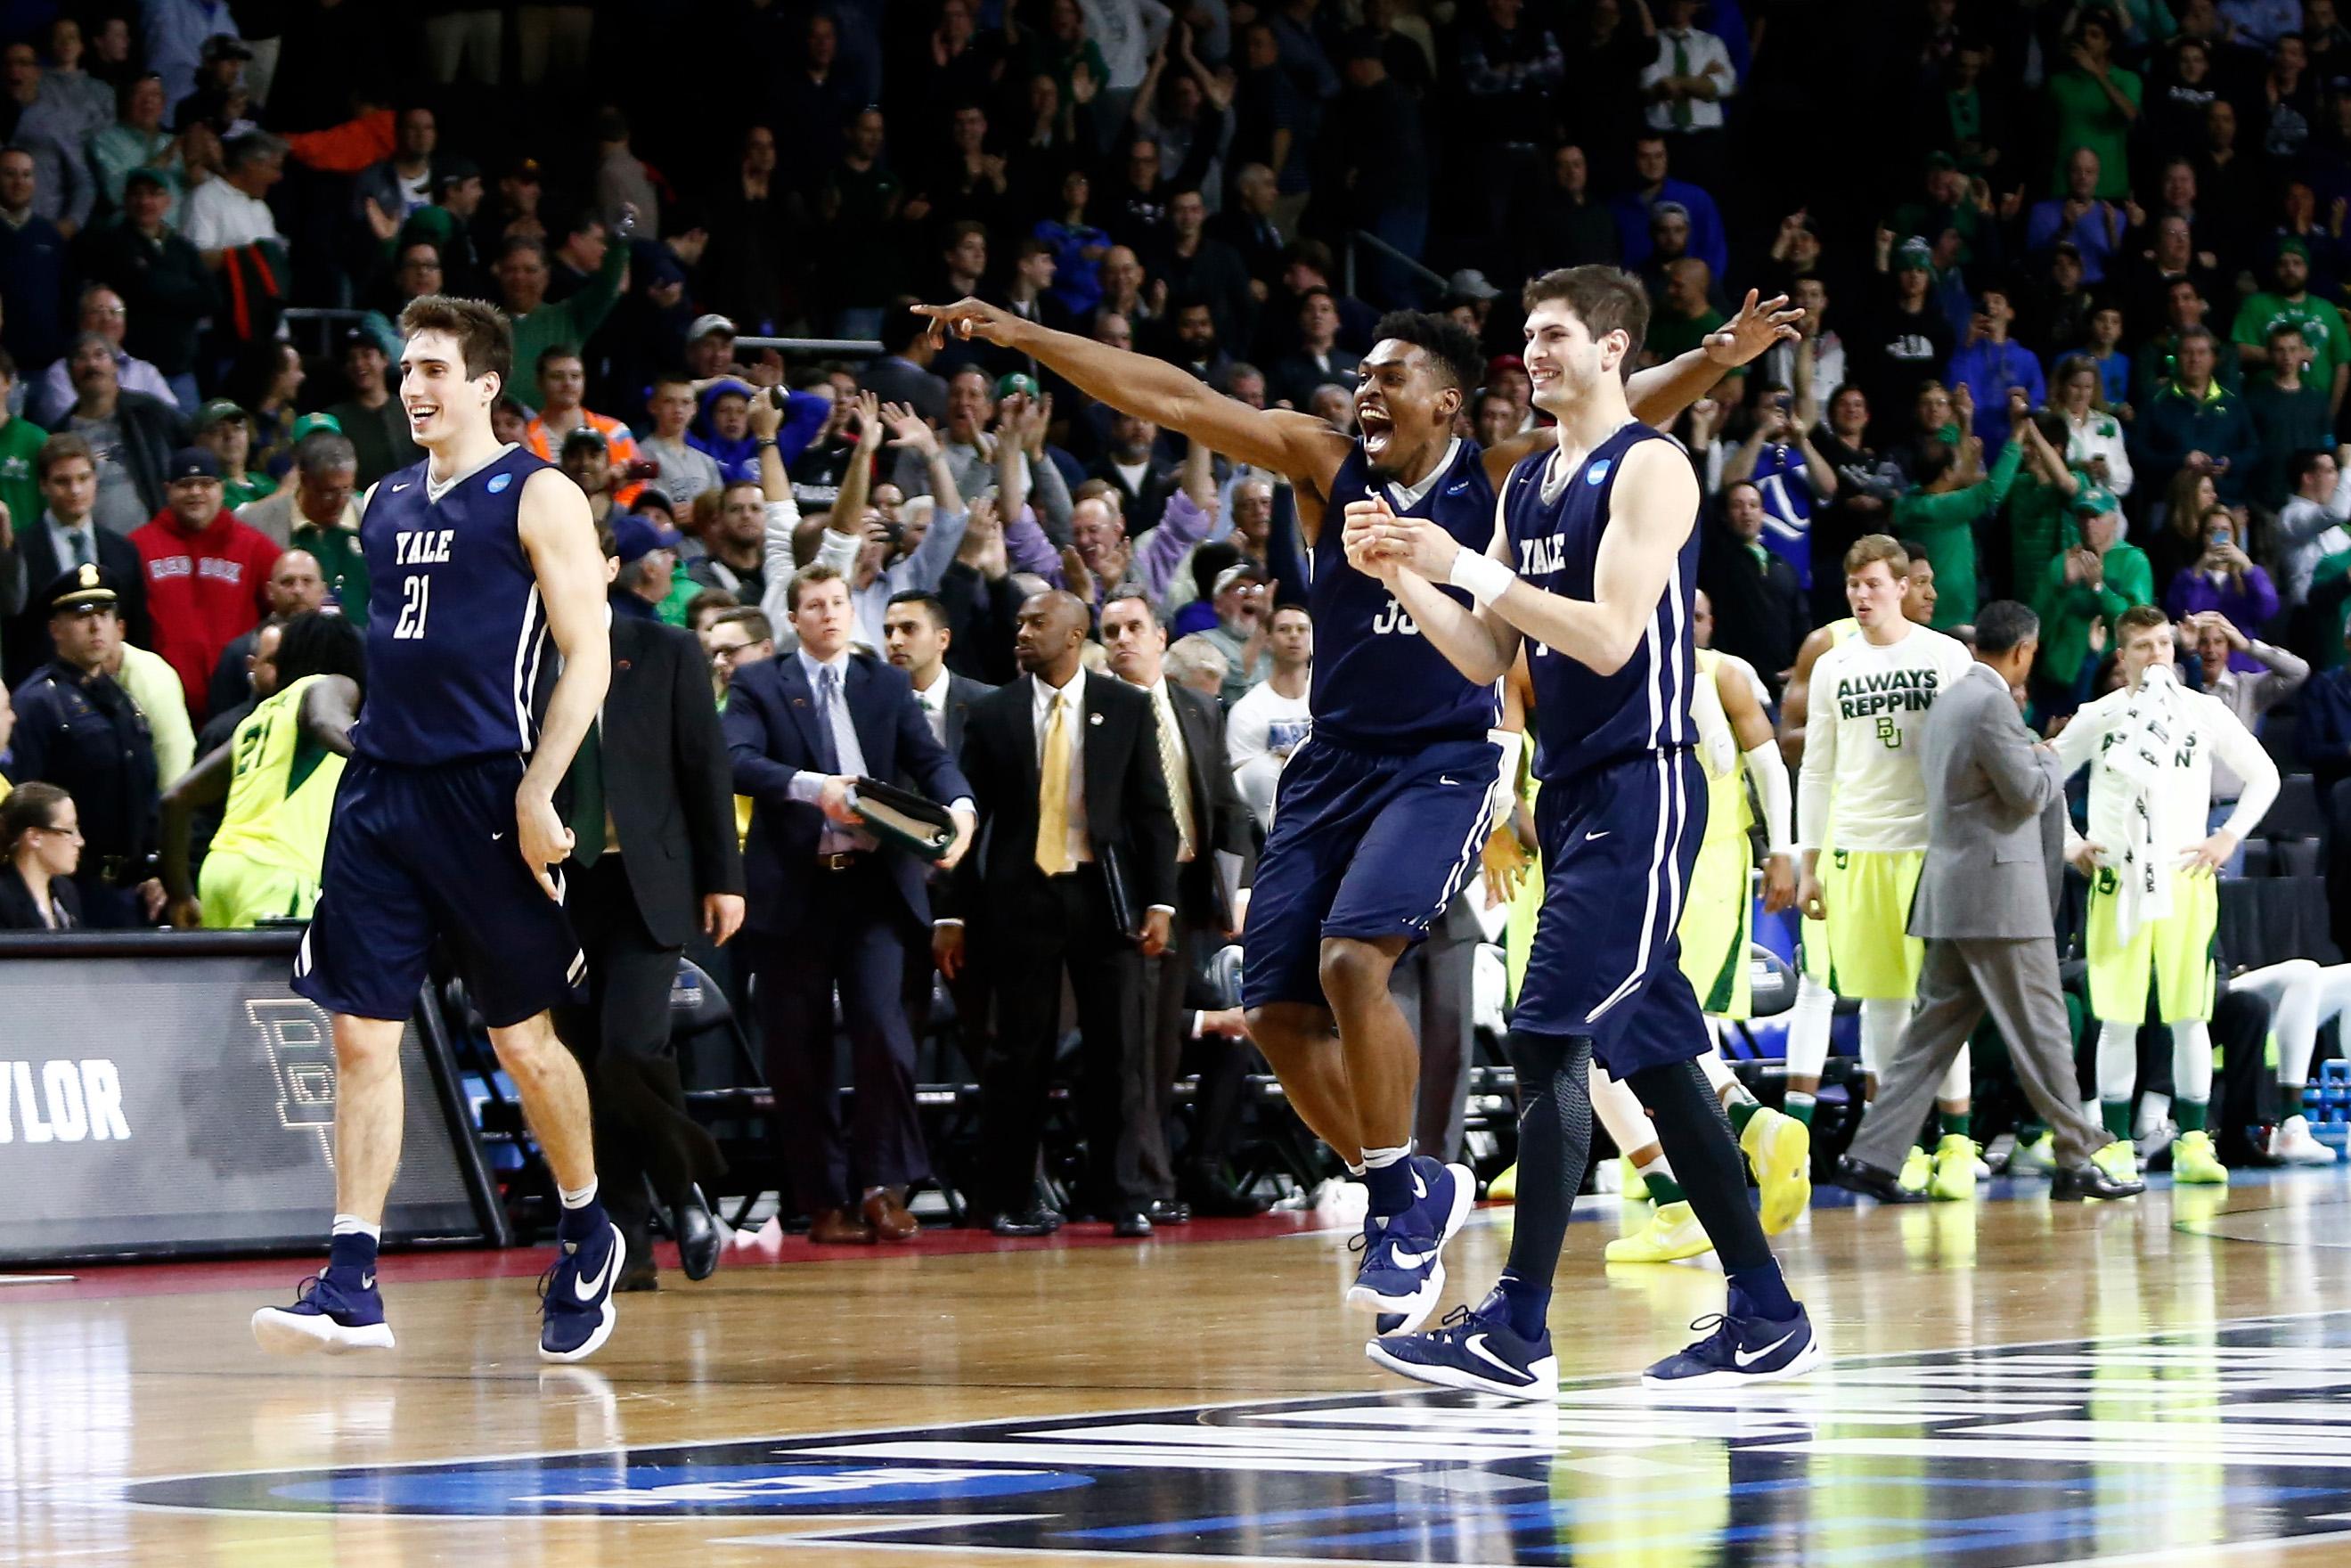 NCAA Basketball: NCAA Tournament- Baylor University vs Yale University